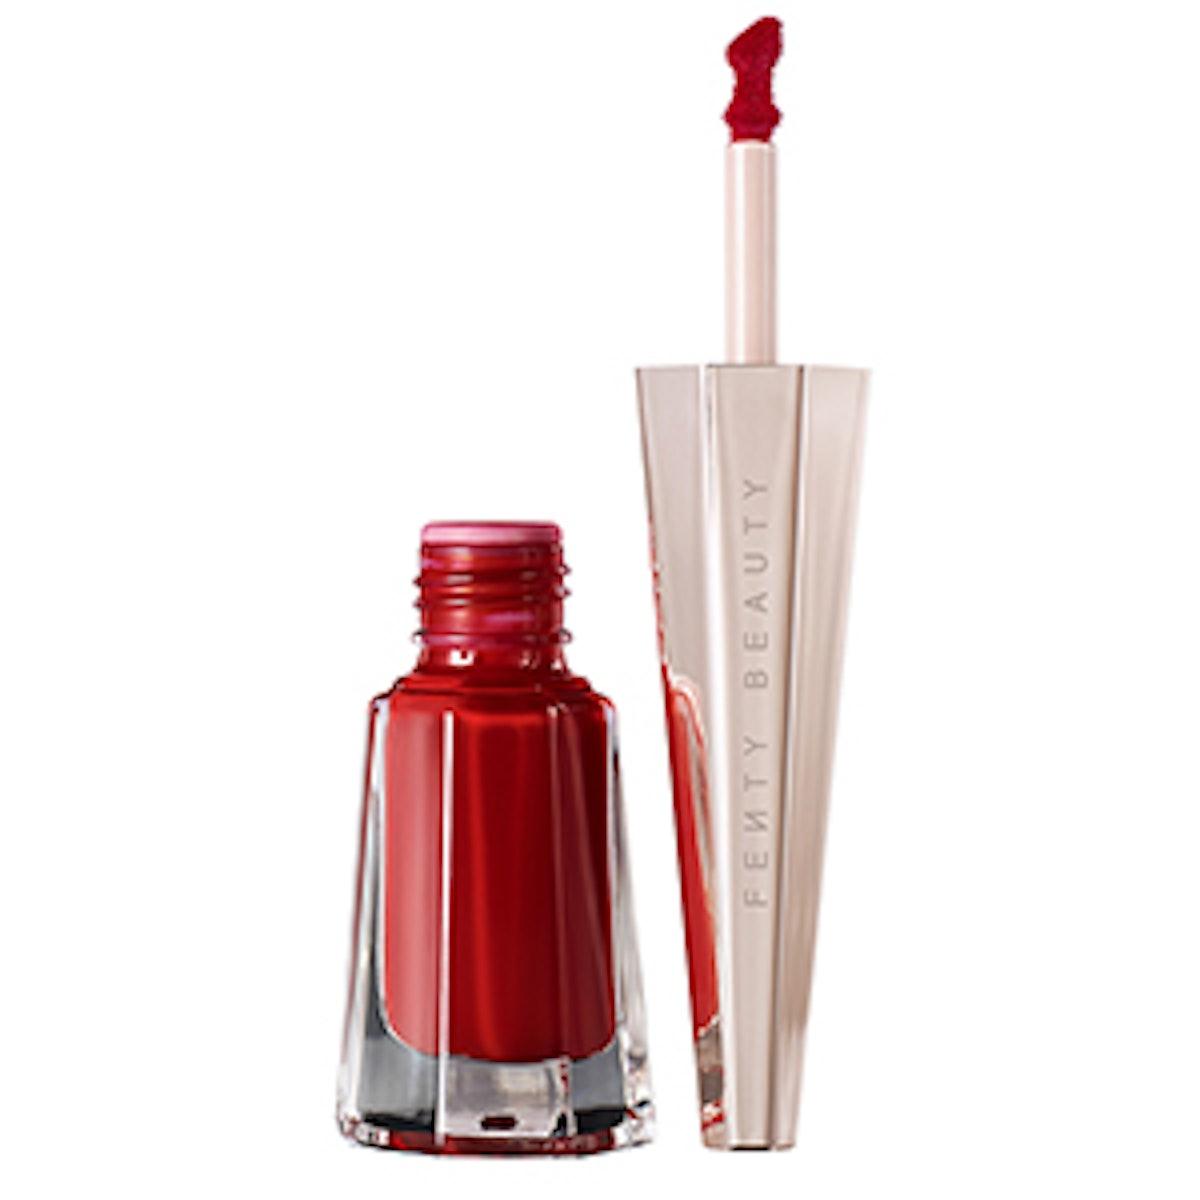 Stunna Lip Paint Longwear Fluid Lip Color